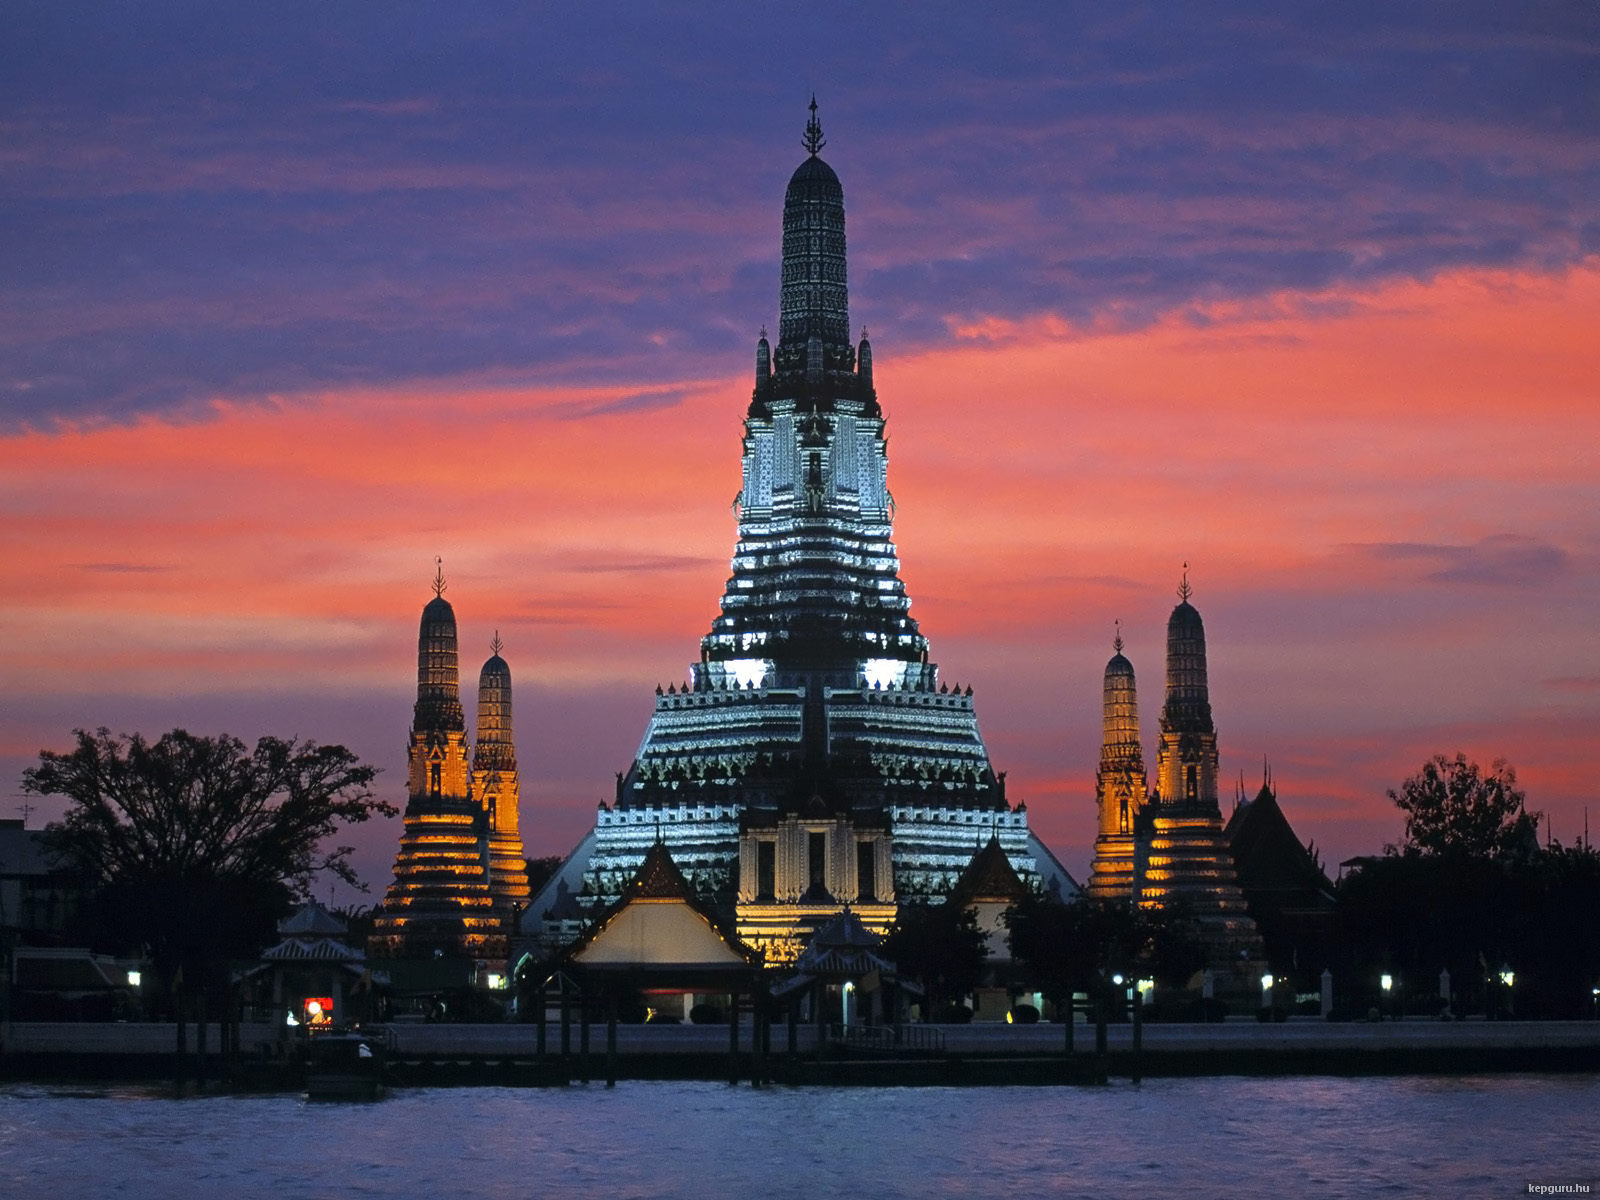 wat-arun-bangkok-thaifold